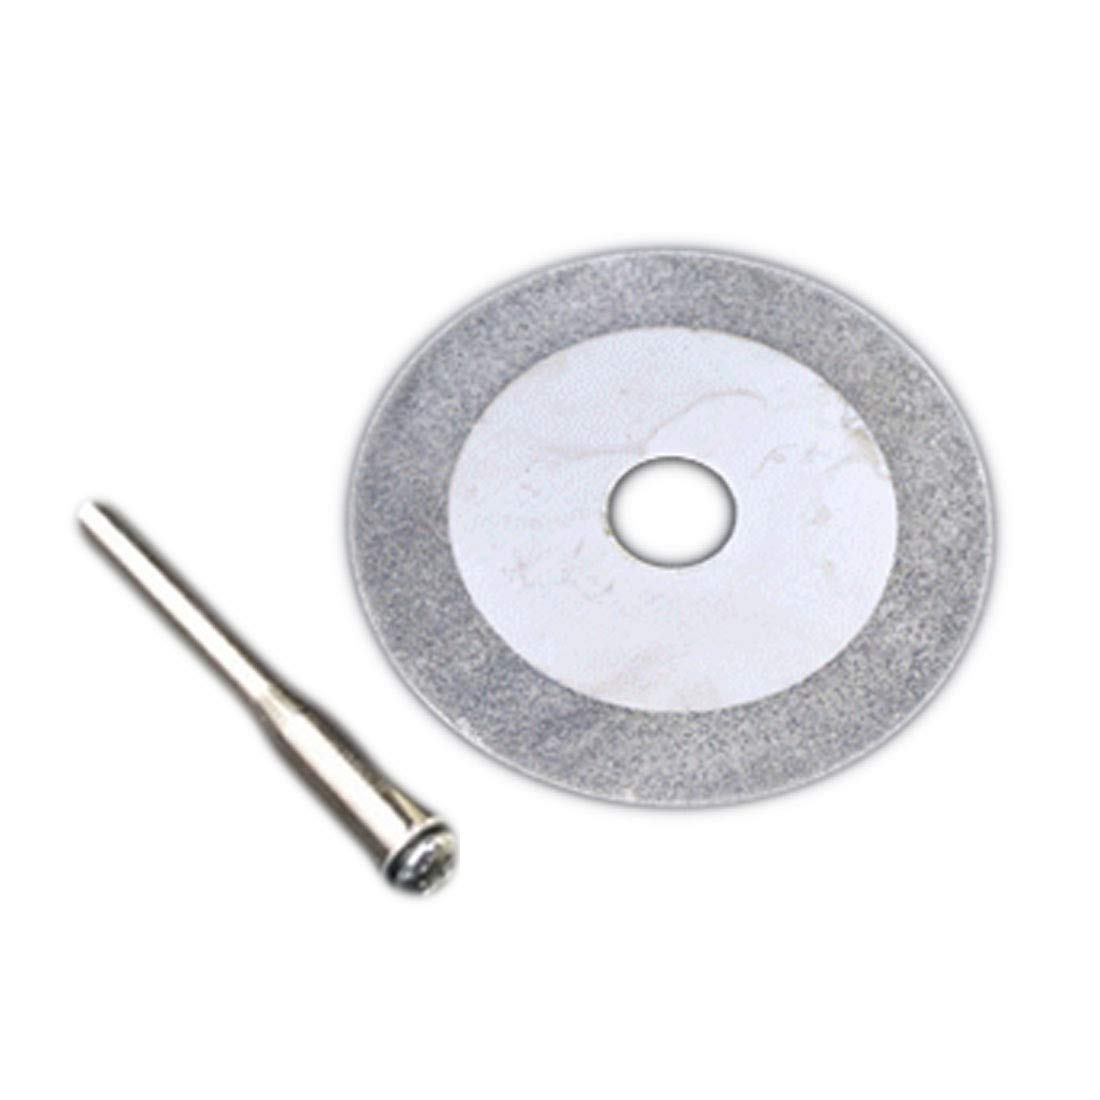 tama/ño : 1pc 60mm 60mm 1pc Diamante Disco de Corte for el Mini Taladro Dremel Herramientas Disco Acero rotativo Circular Herramienta de Sierra de Diamante abrasivo Hoja de Sierra F-MINGNIAN-TOOL